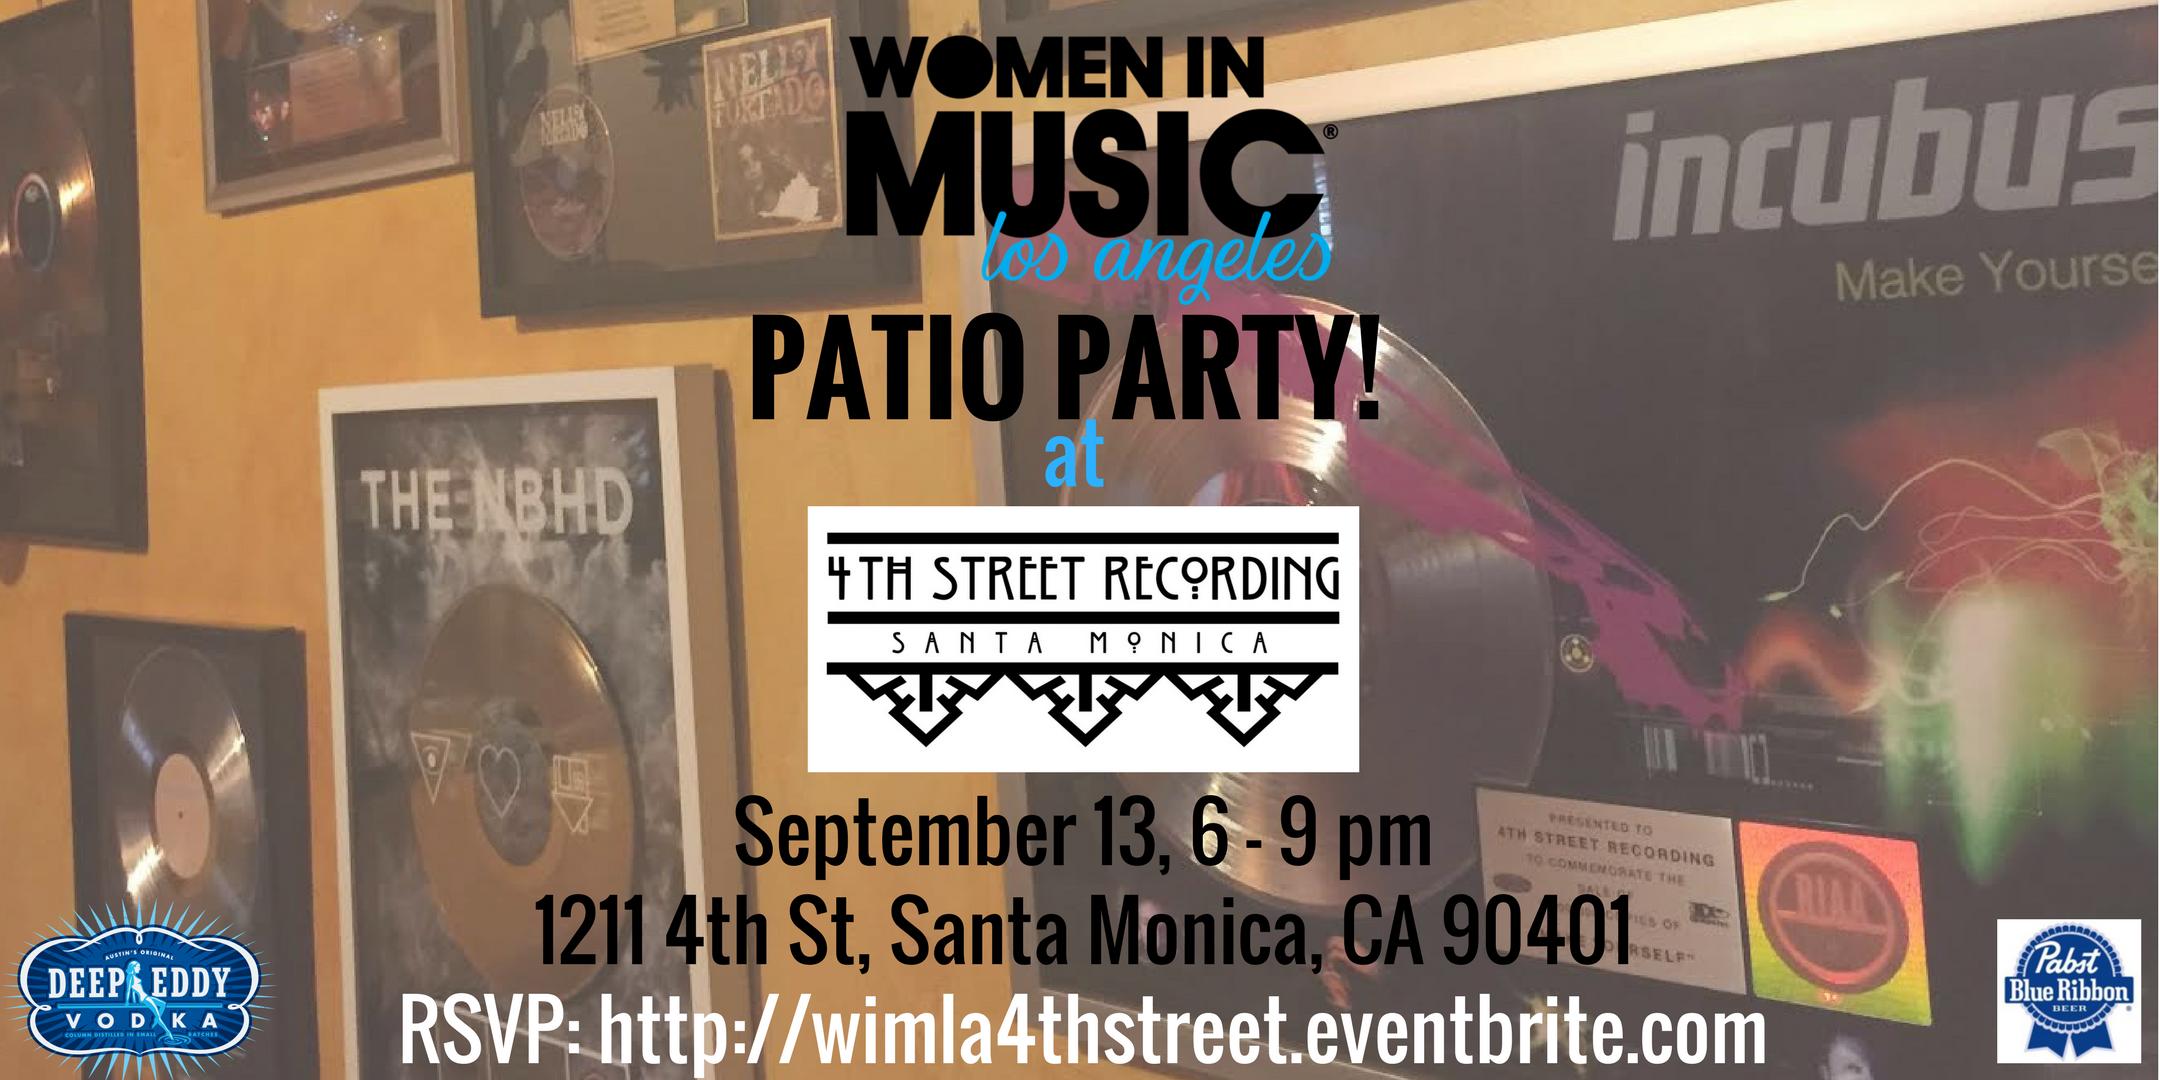 PATIO PARTY! Eventbrite.png